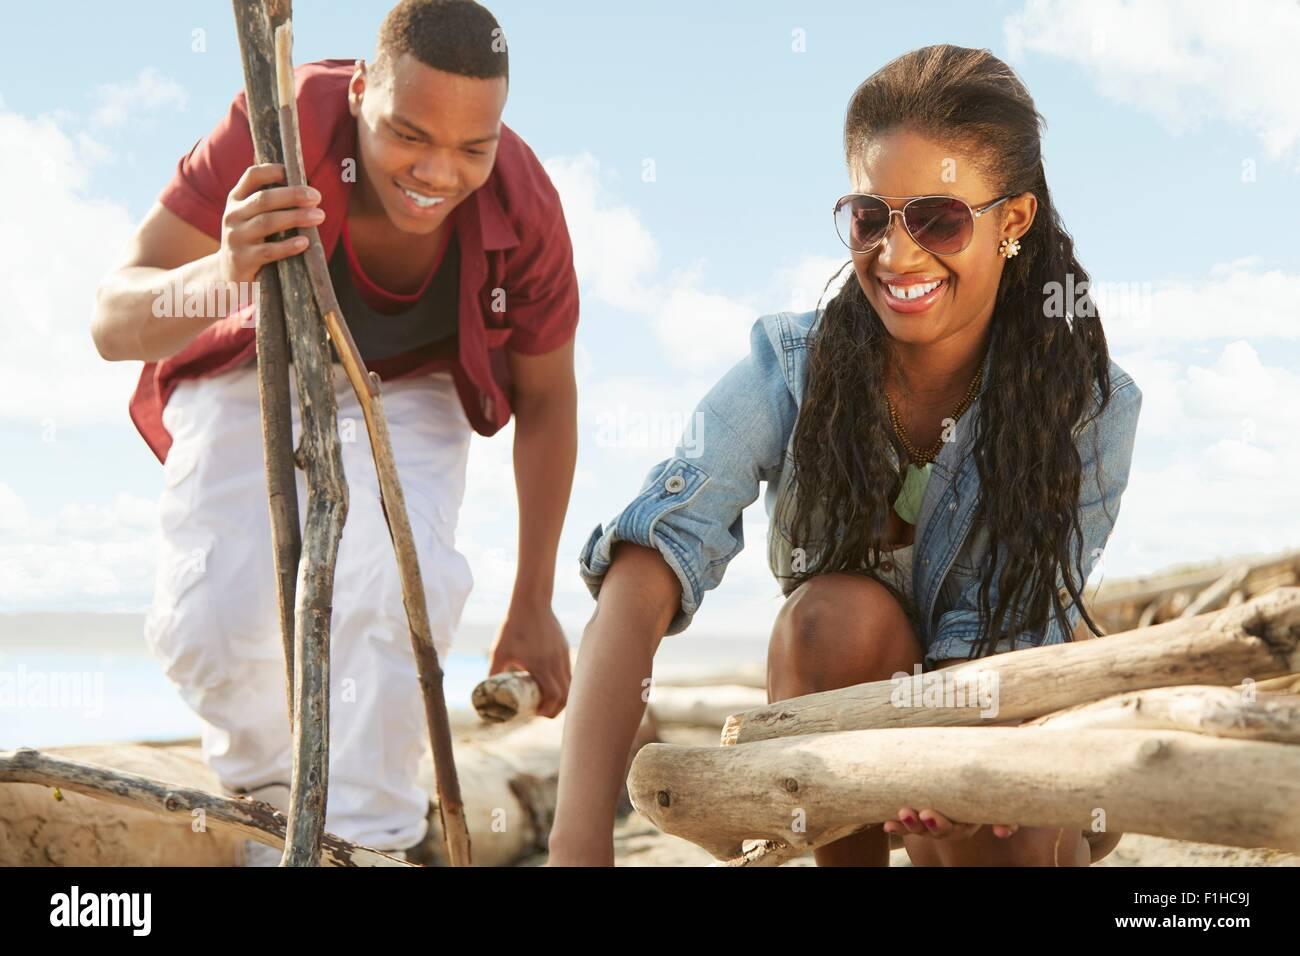 Pareja joven en la playa encuentro driftwood juntos Imagen De Stock